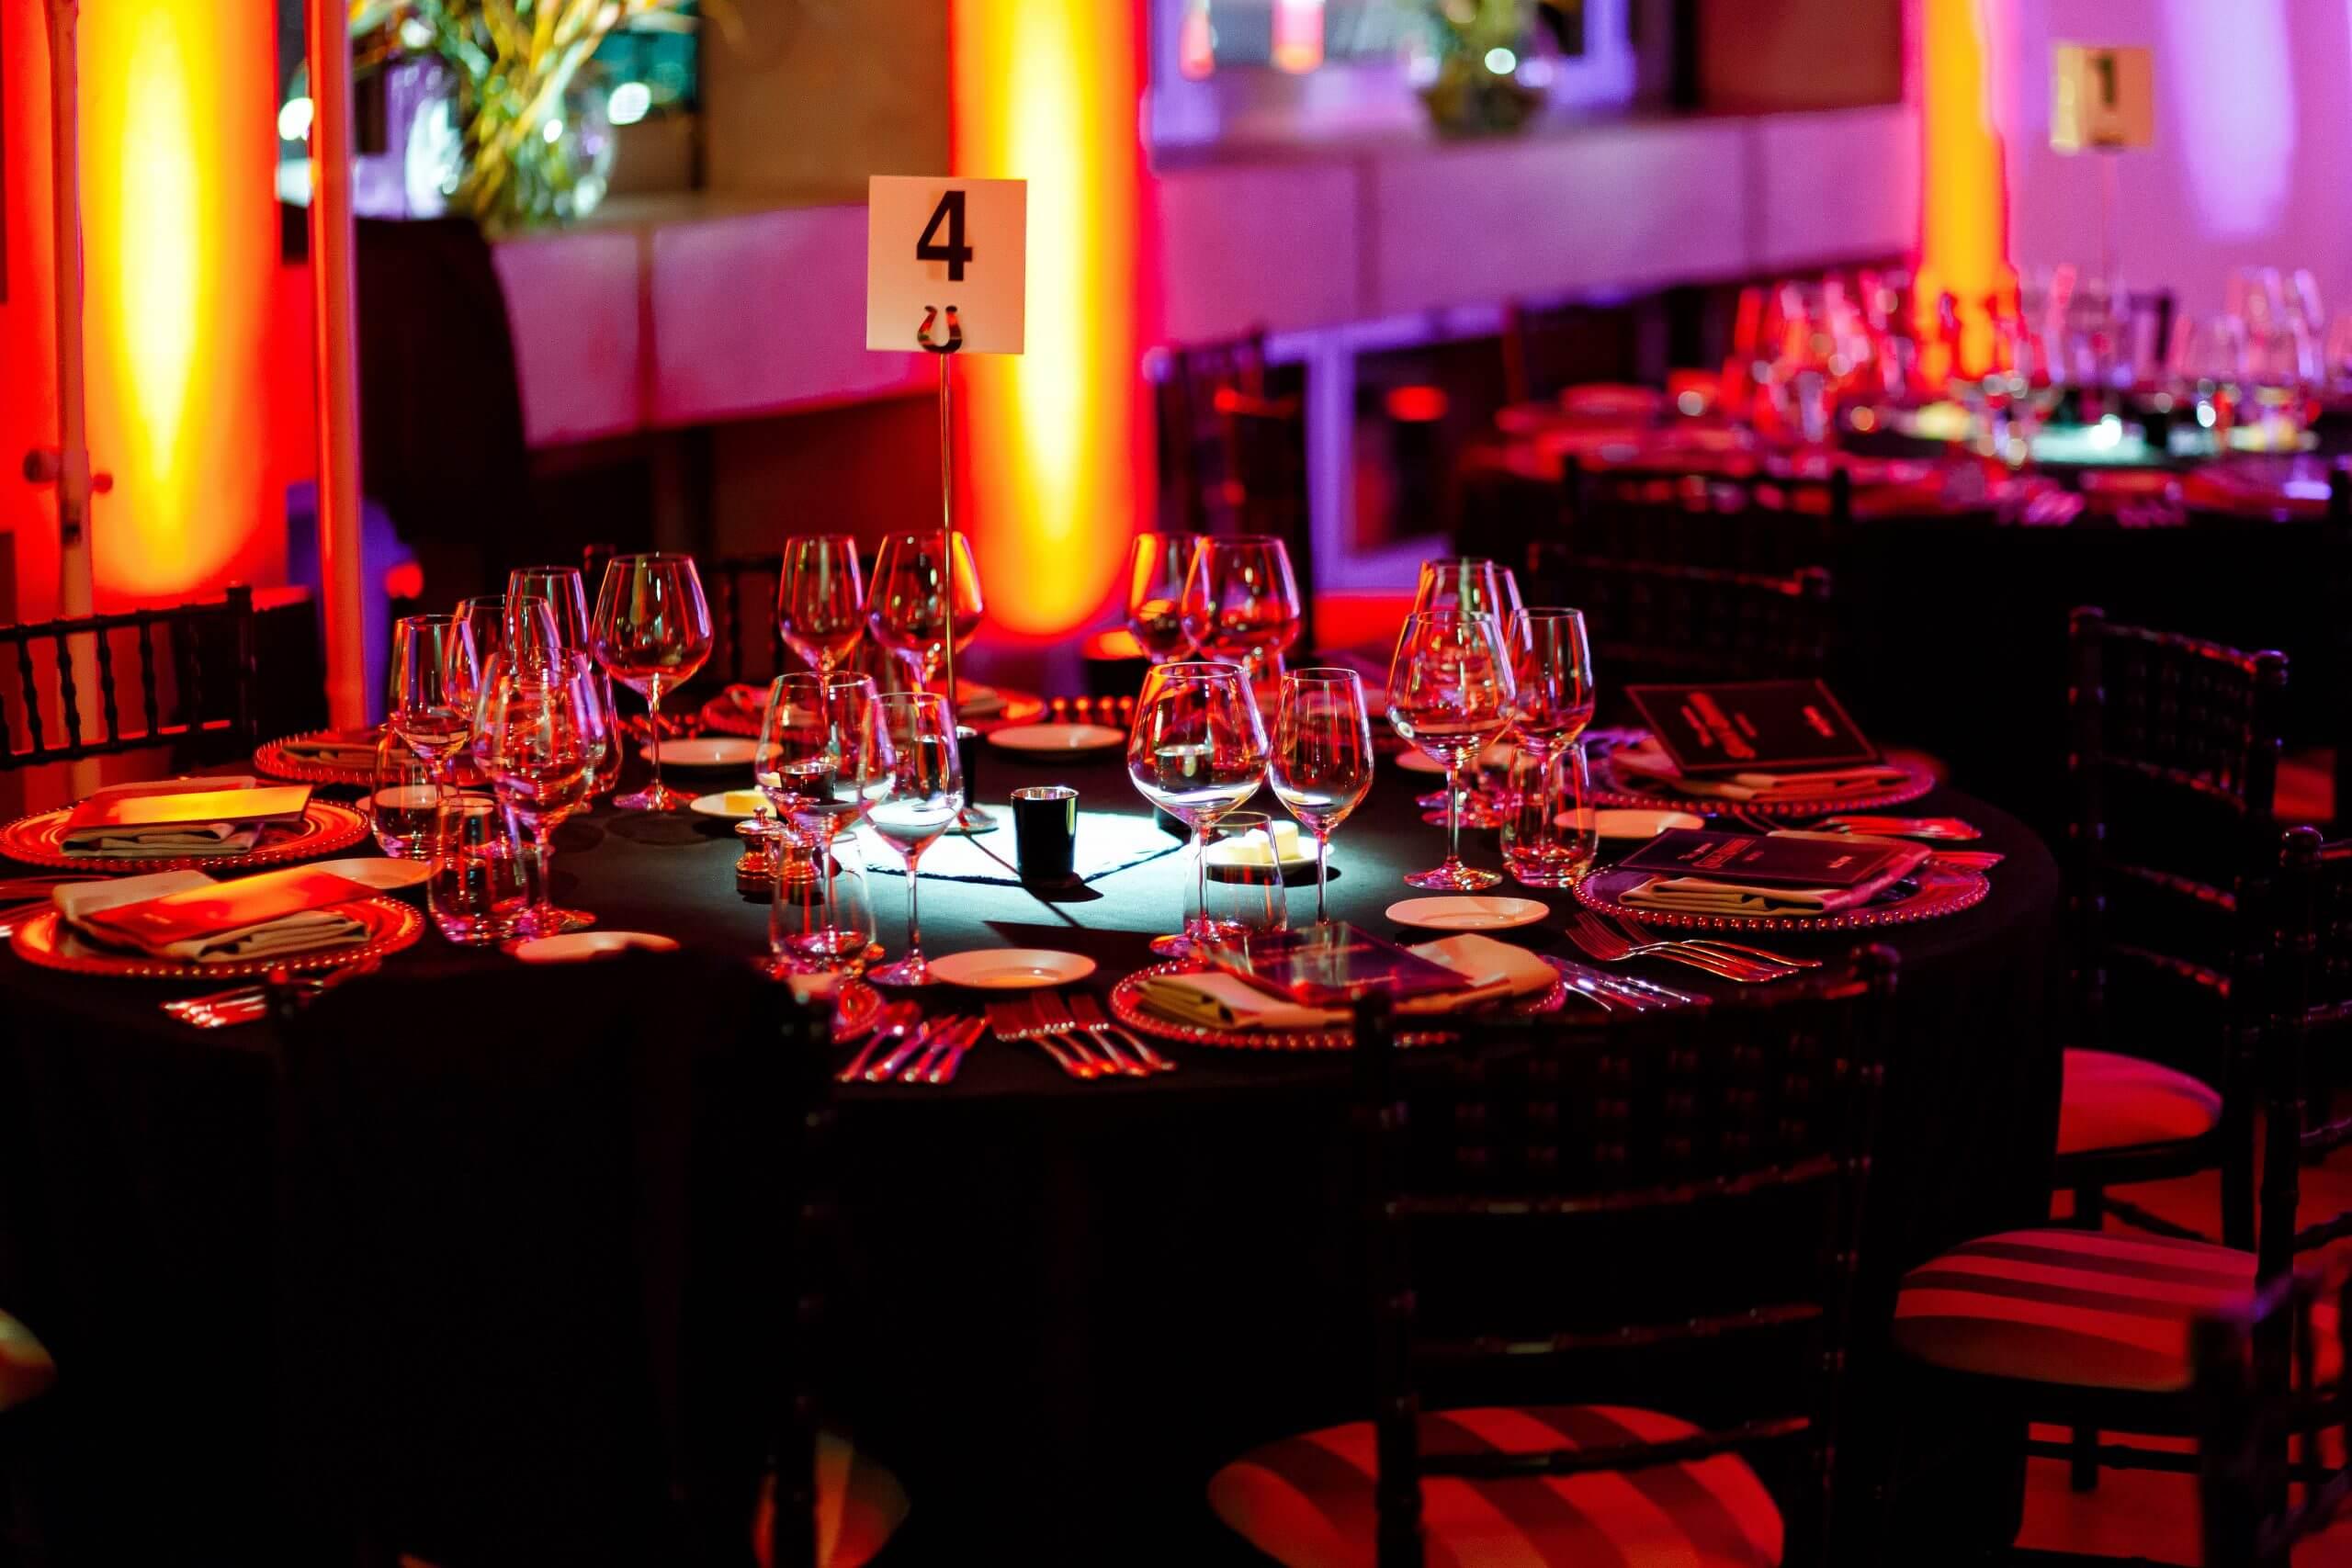 Tate Modern Gala Dinner'